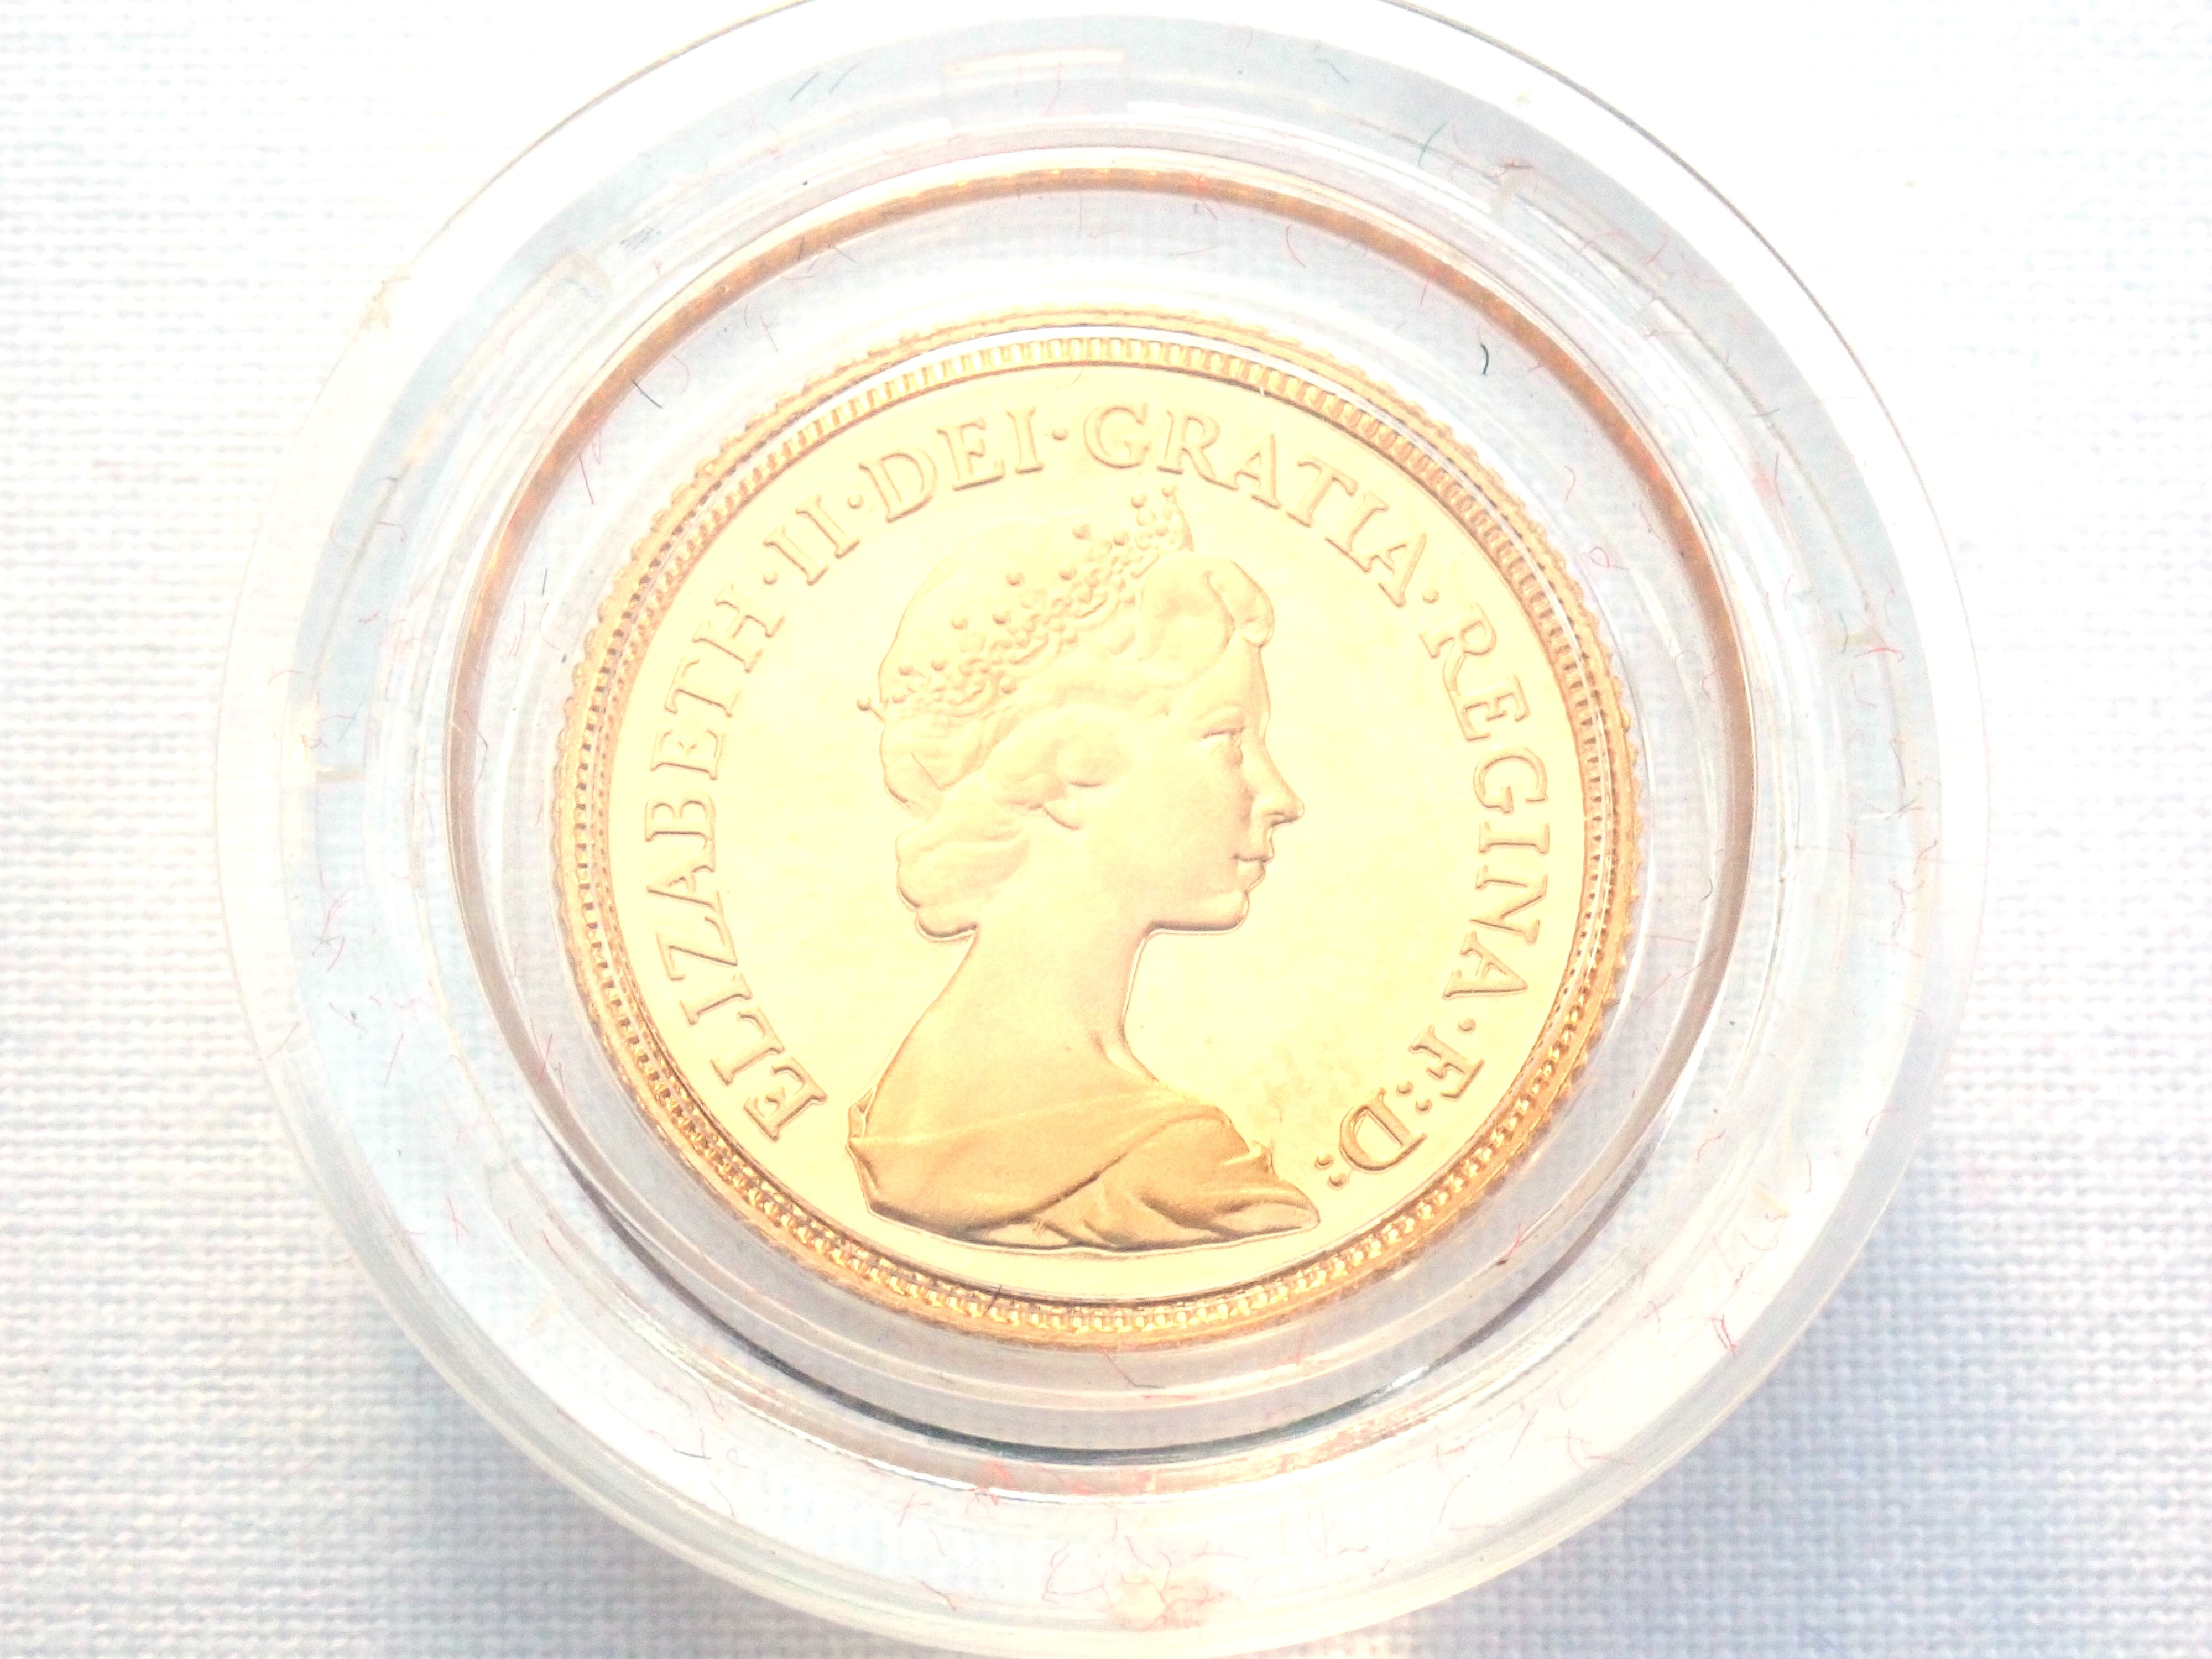 AA000700 - 1980 Proof Gold Half Sovereign Red Boxed 22k Elizabeth II 2nd Portrait #175